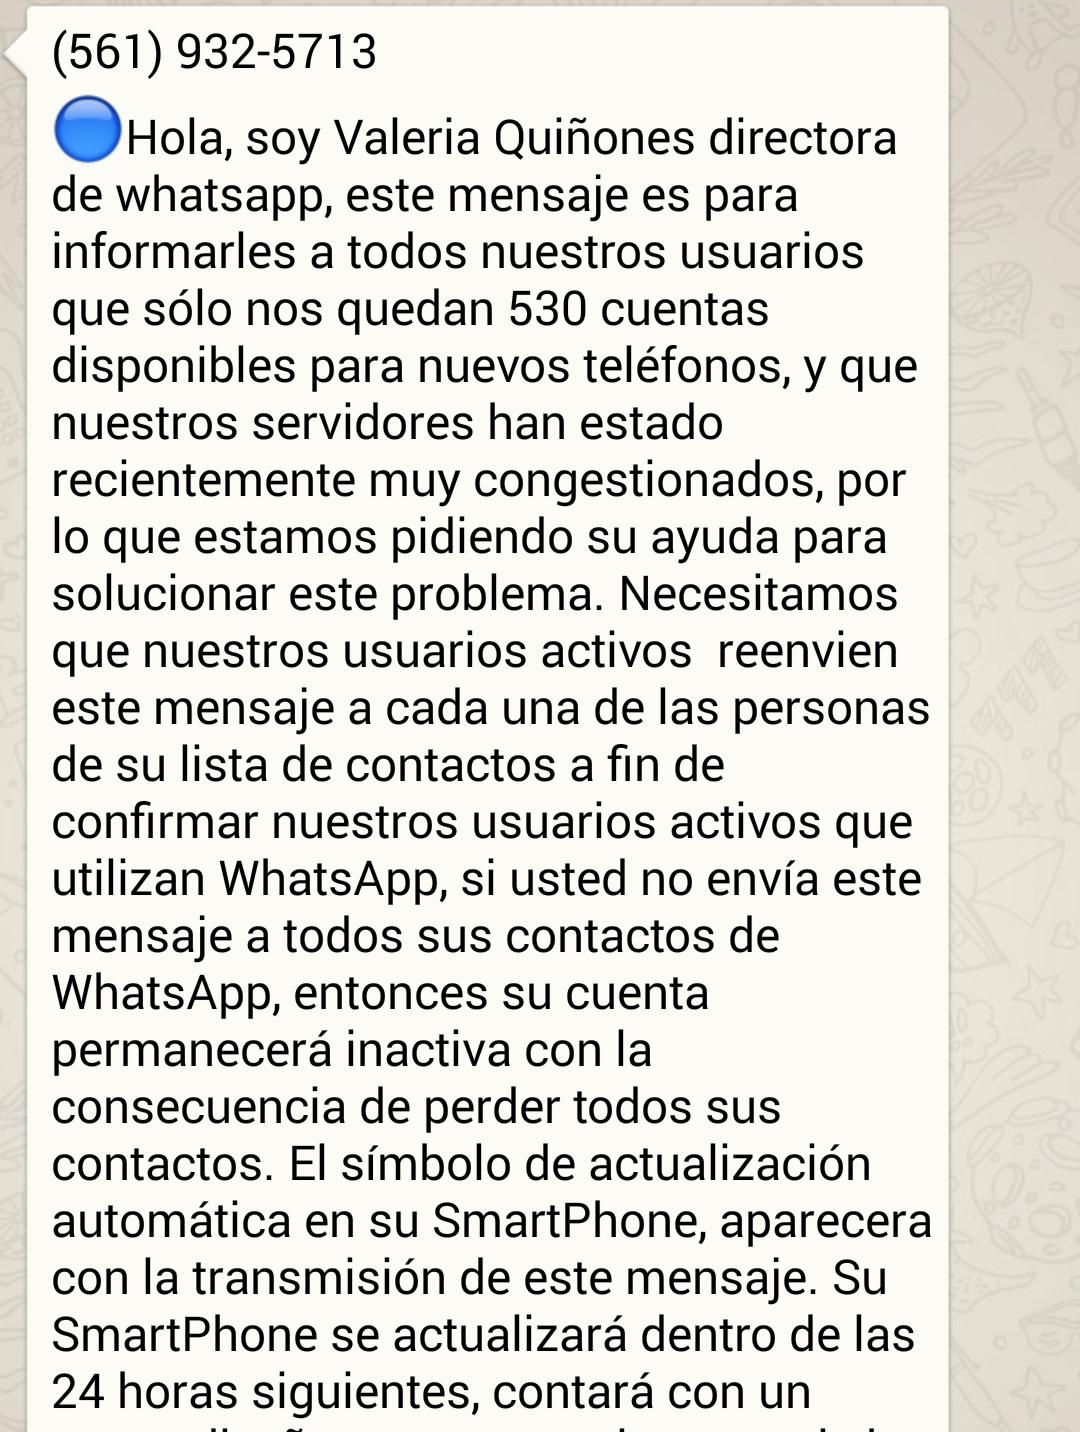 putas con telefono whatsapp chicas putas